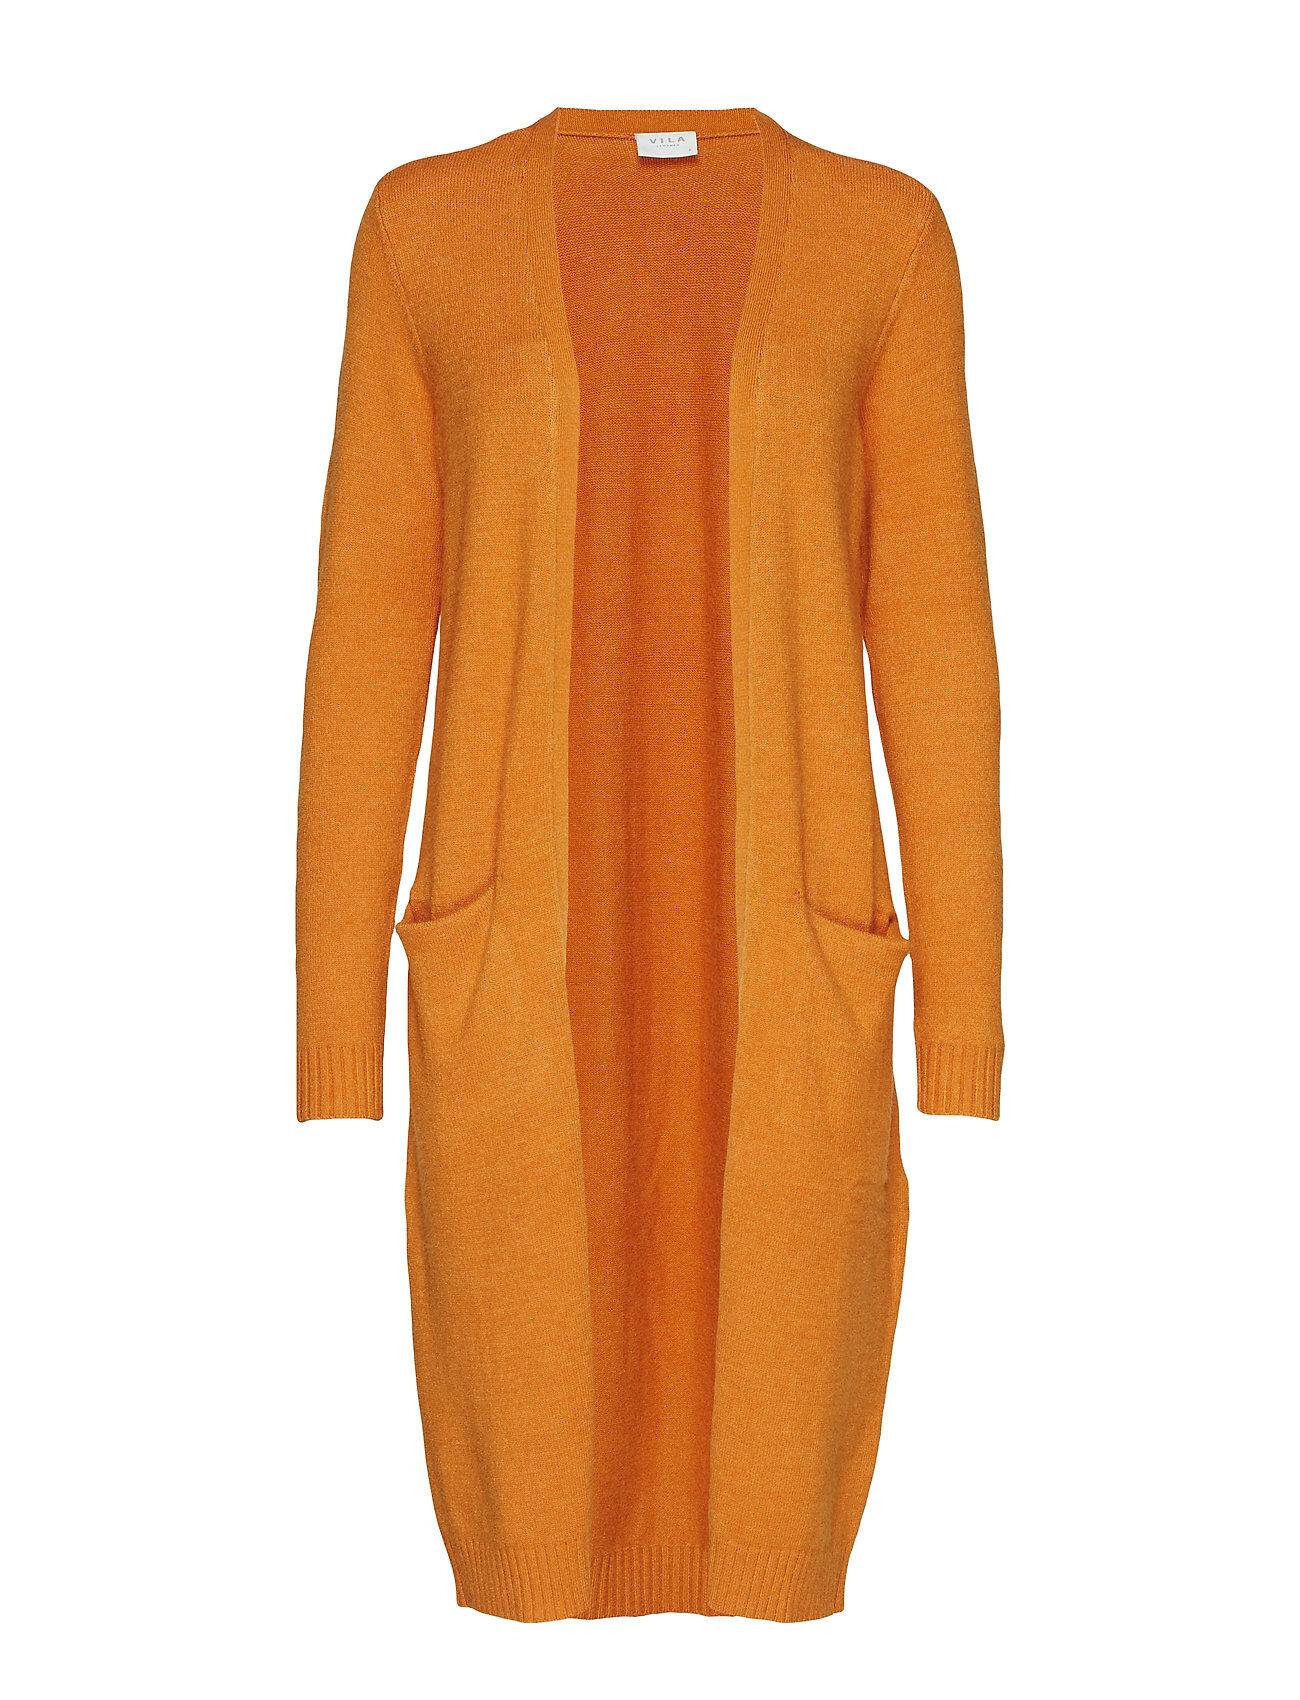 Vila Viril Long L/S Knit Cardigan - Noos Neuletakki Oranssi Vila